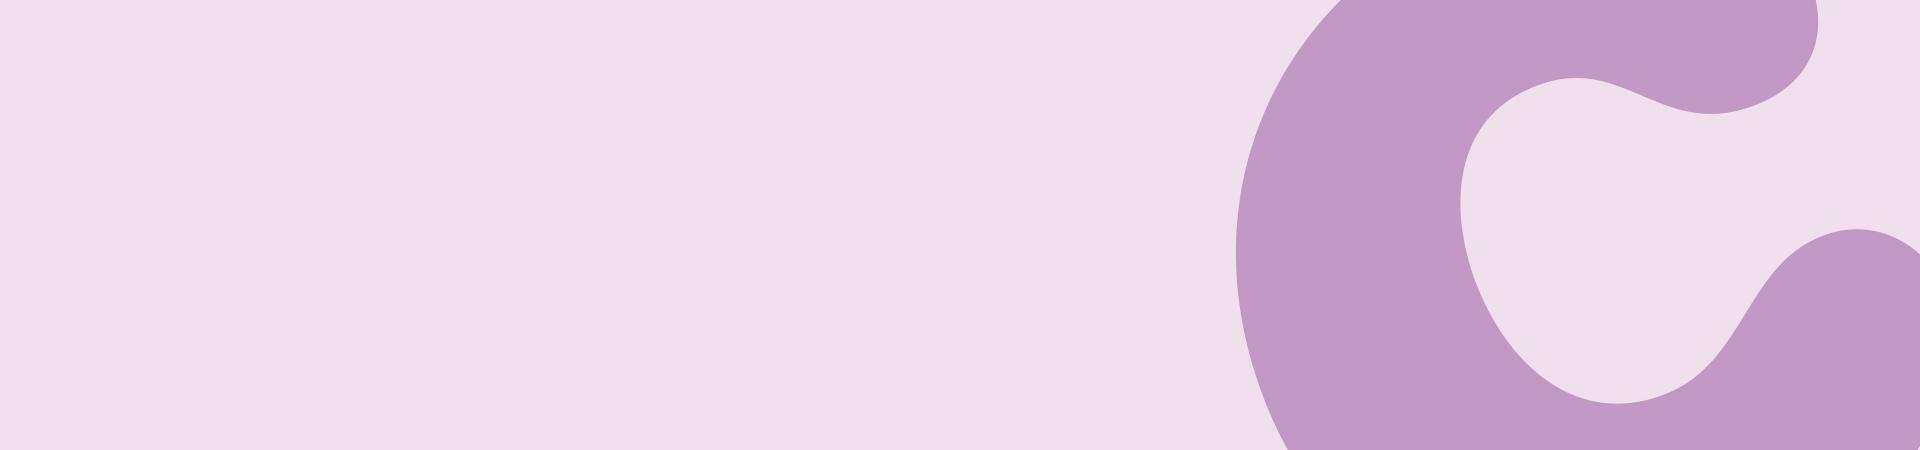 Pink banner image